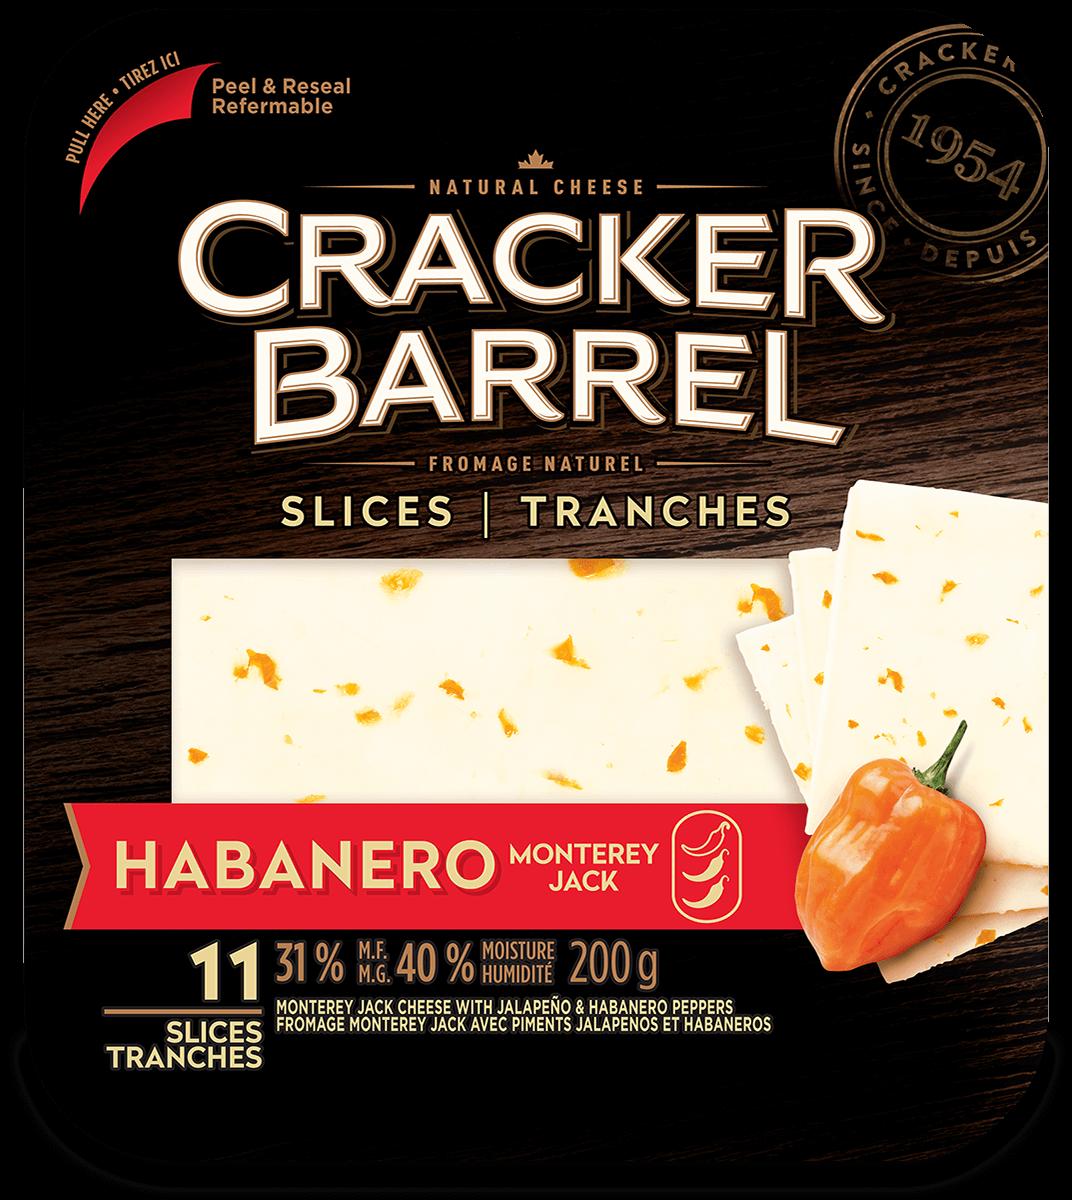 Cracker Barrel Cheese Slices - Habanero Monterey Jack - 11 Slices - 200 g